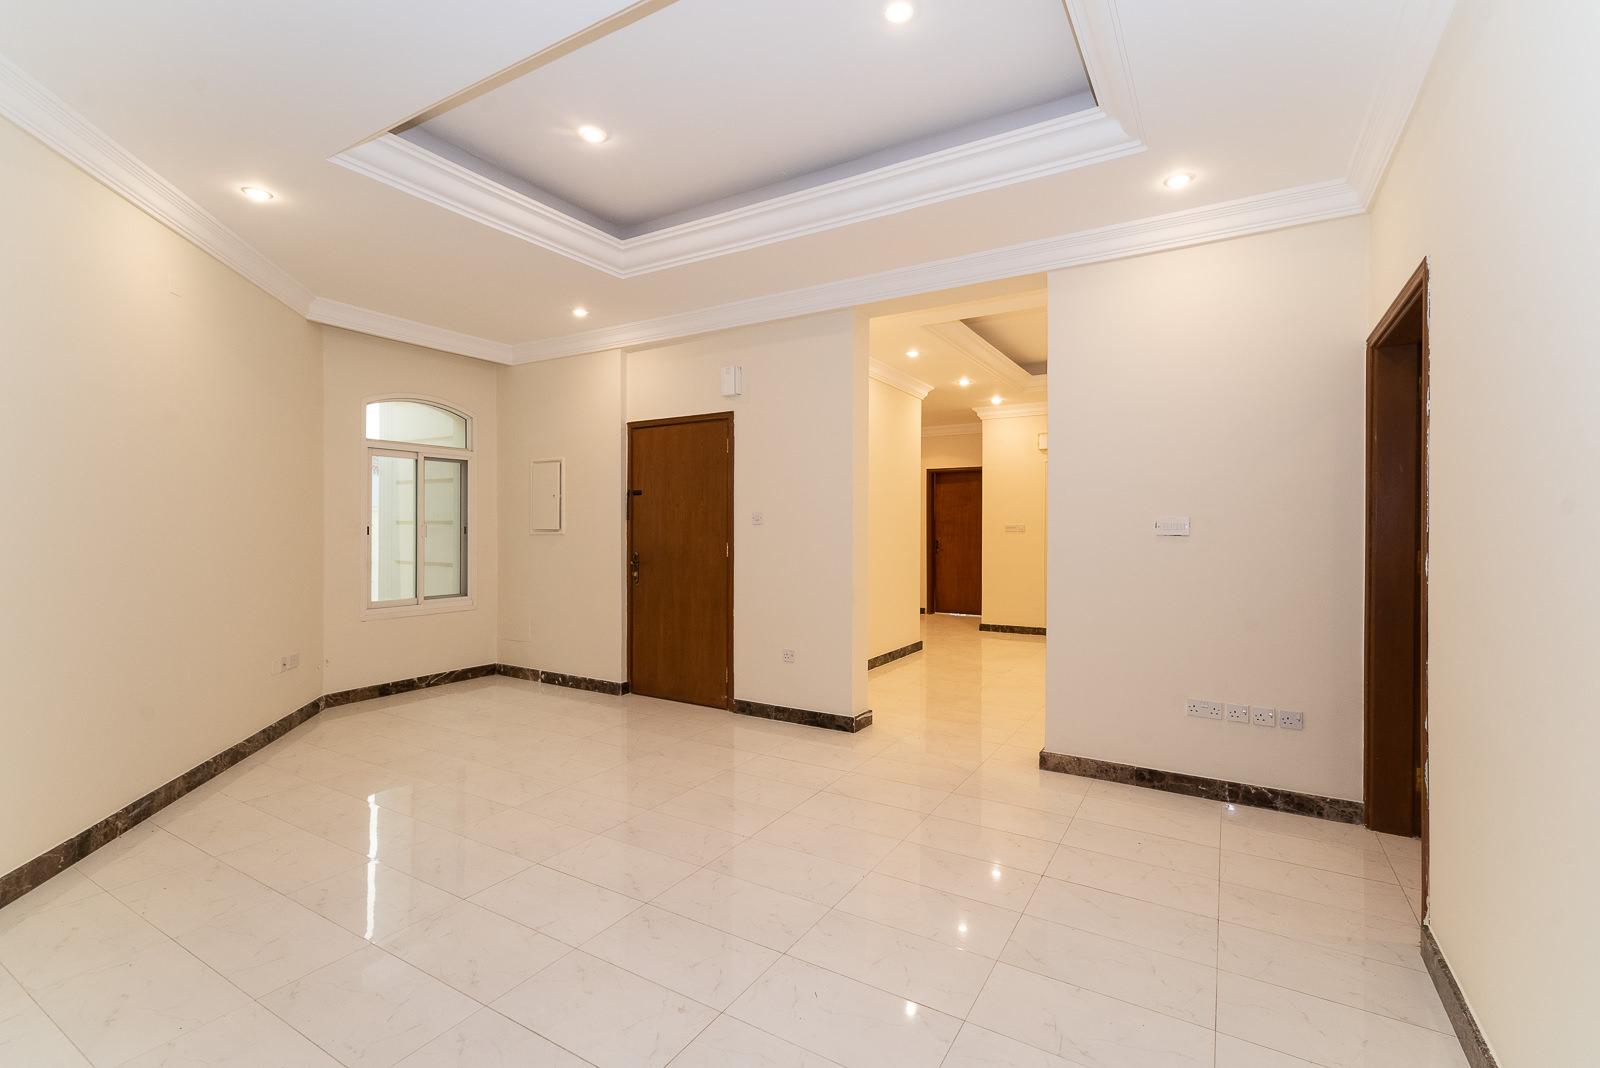 Abu Al Hasania – lovely, spacious, unfurnished, three bedroom floor w/terrace